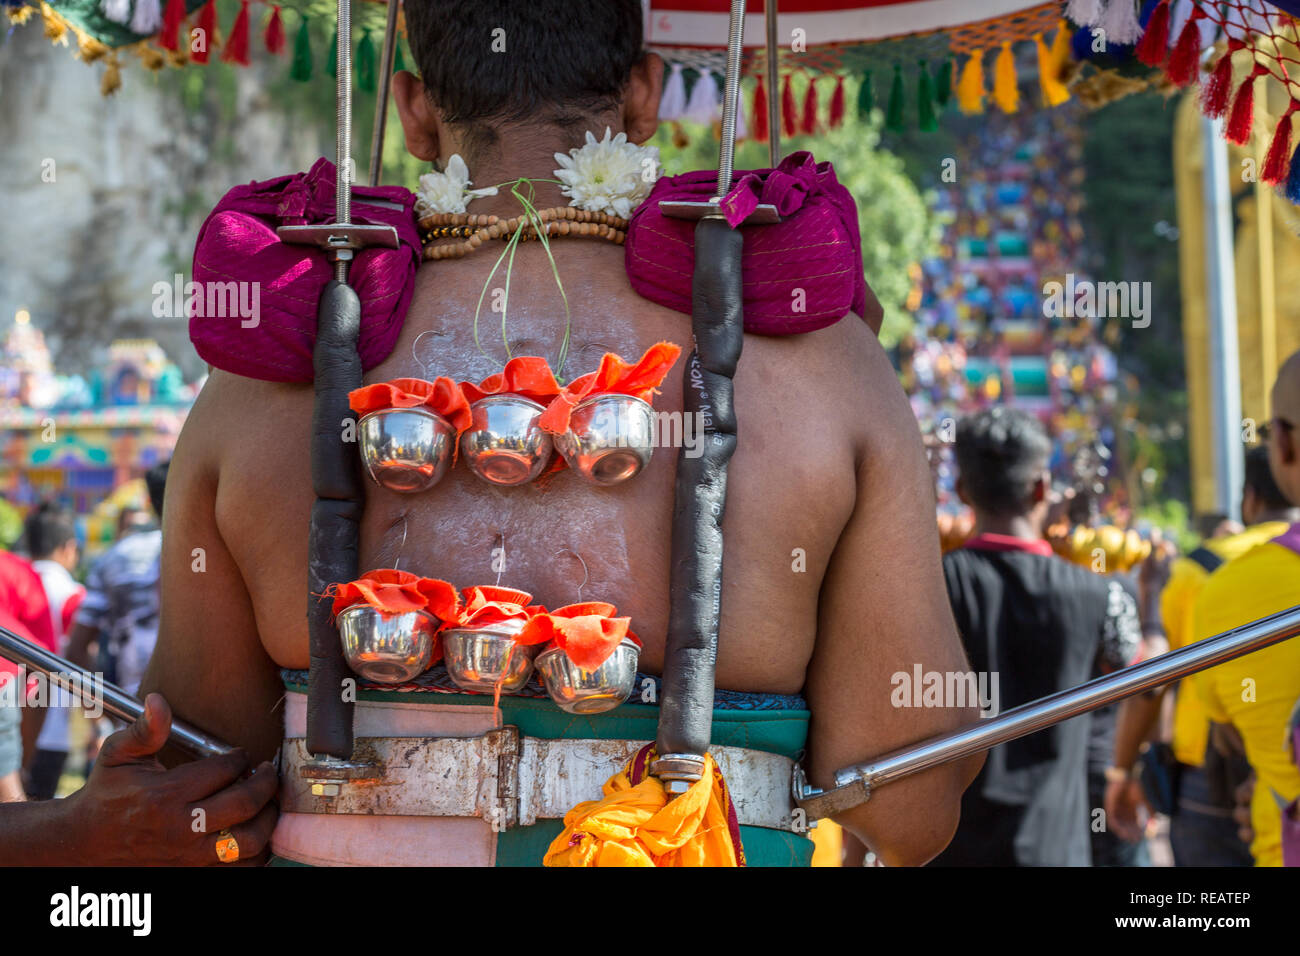 Kuala Lumpur, Malaysia 20 January 2019 - Hindu devotee carries